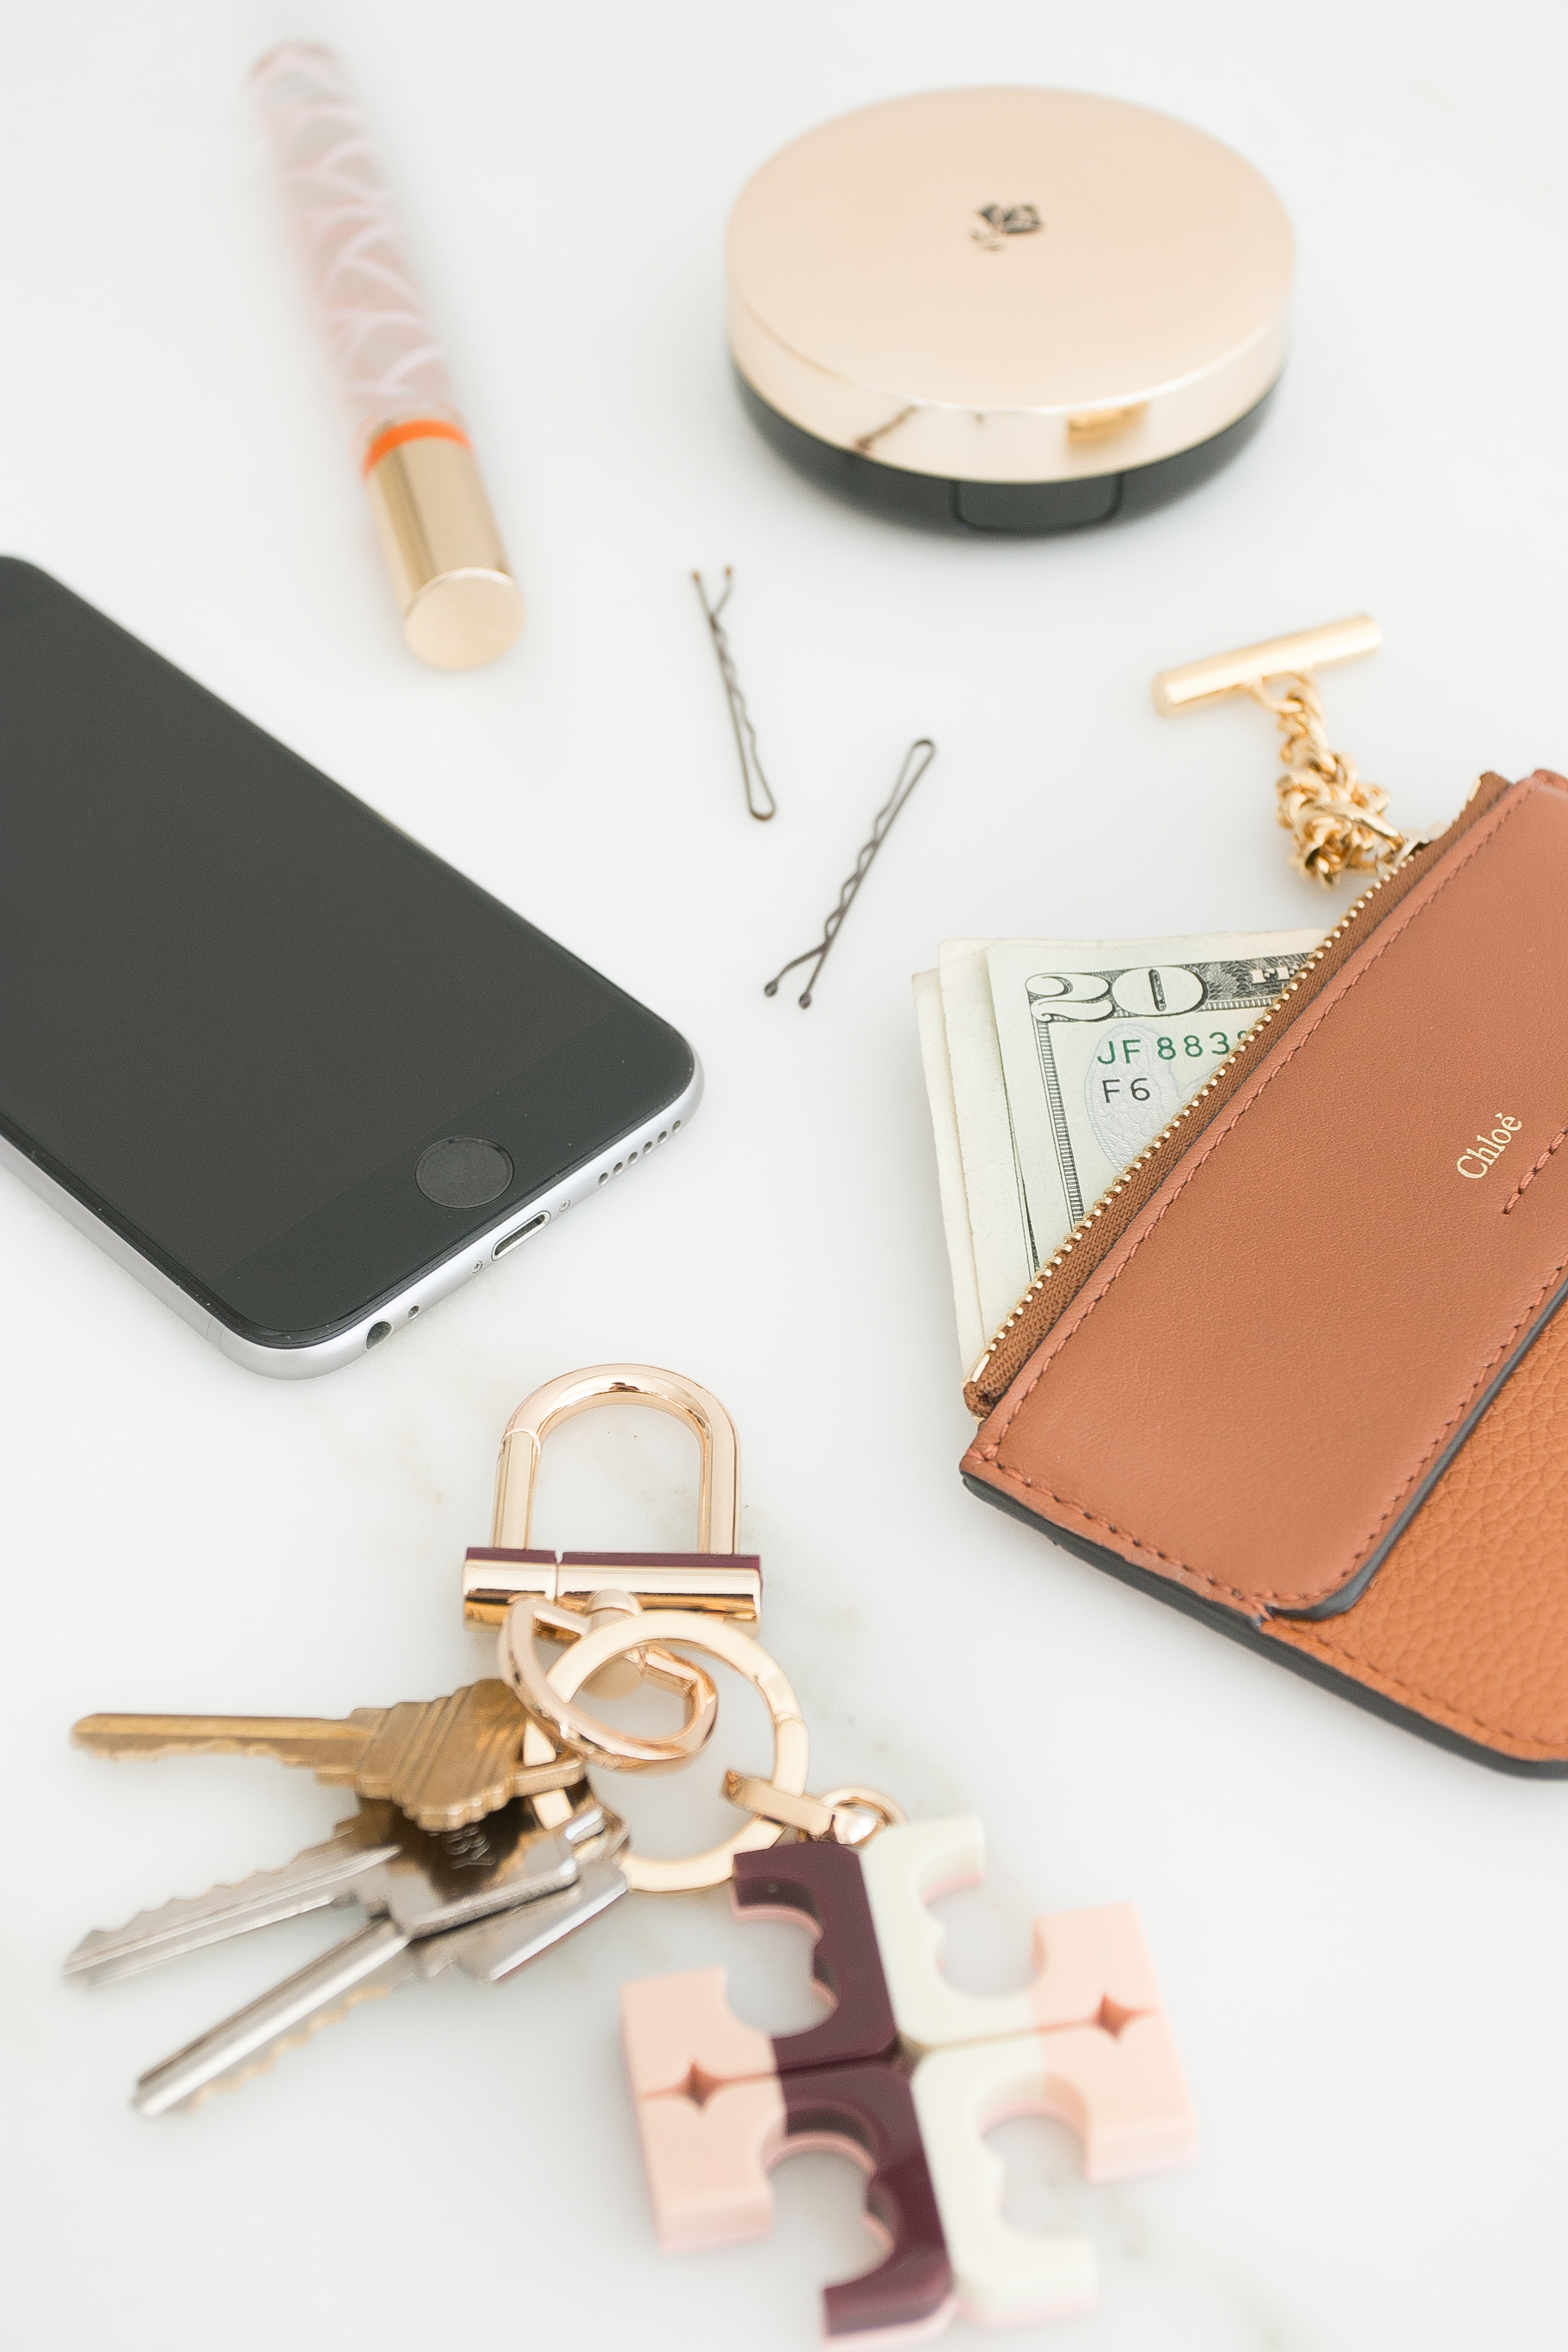 Lancome Chloe Clutch Essentials Make up Monika Hibbs